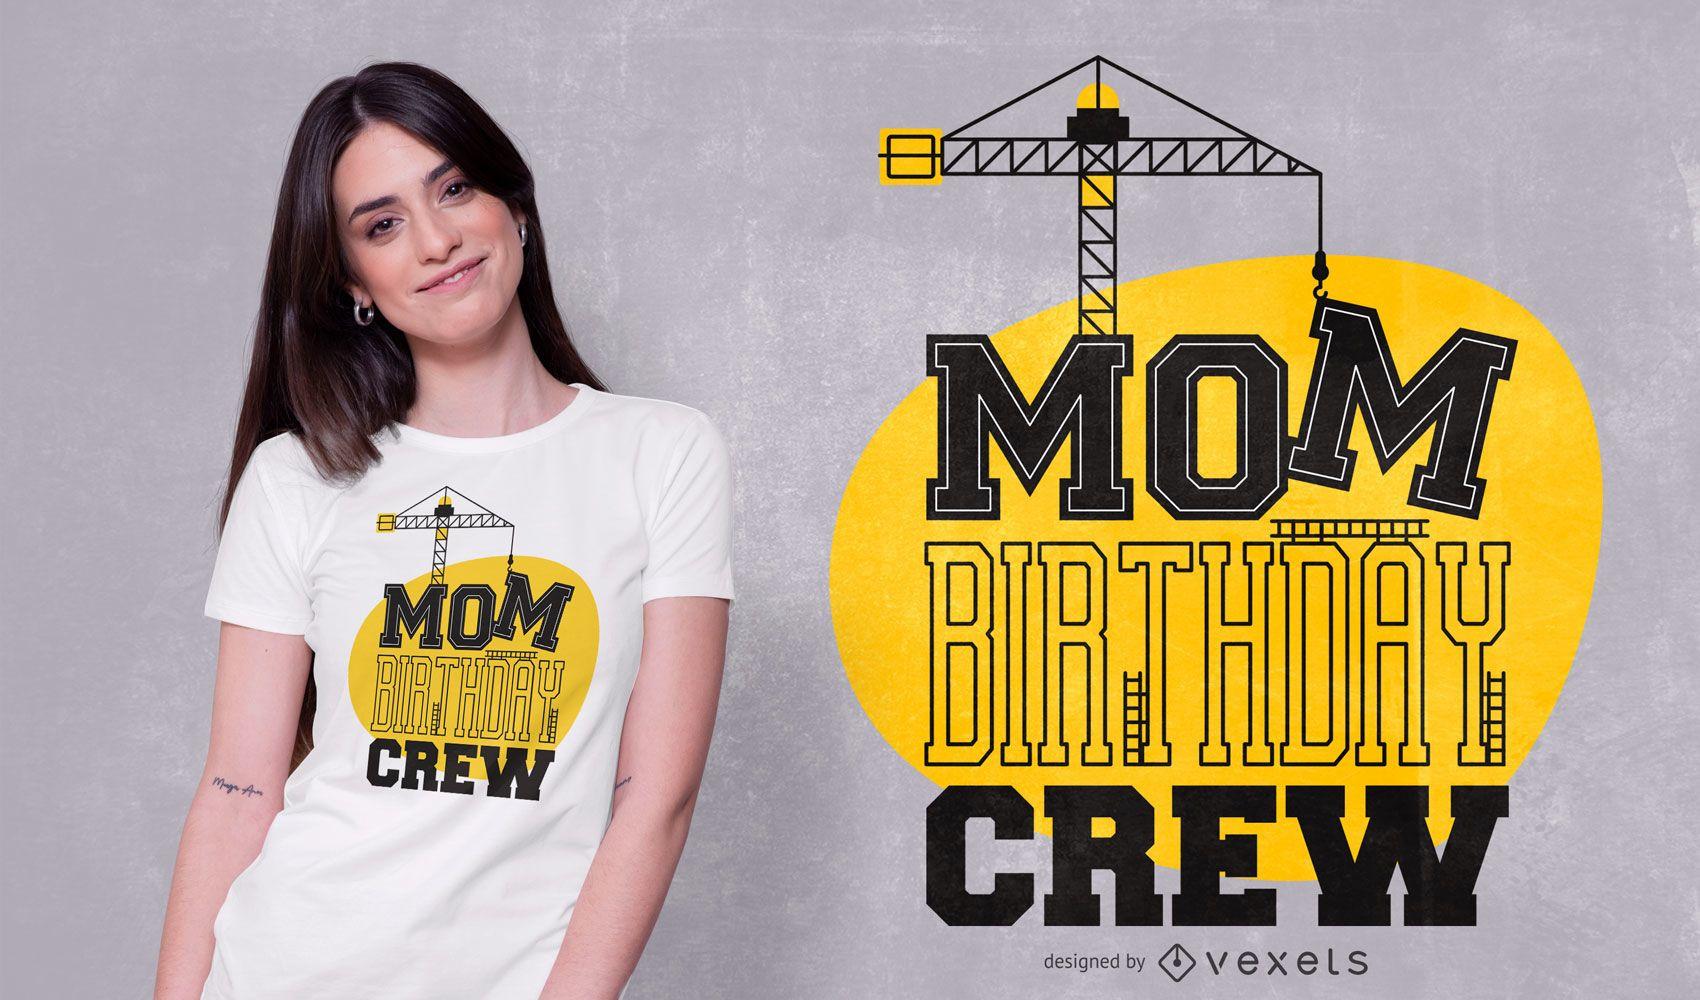 Mom birthday crew t-shirt design